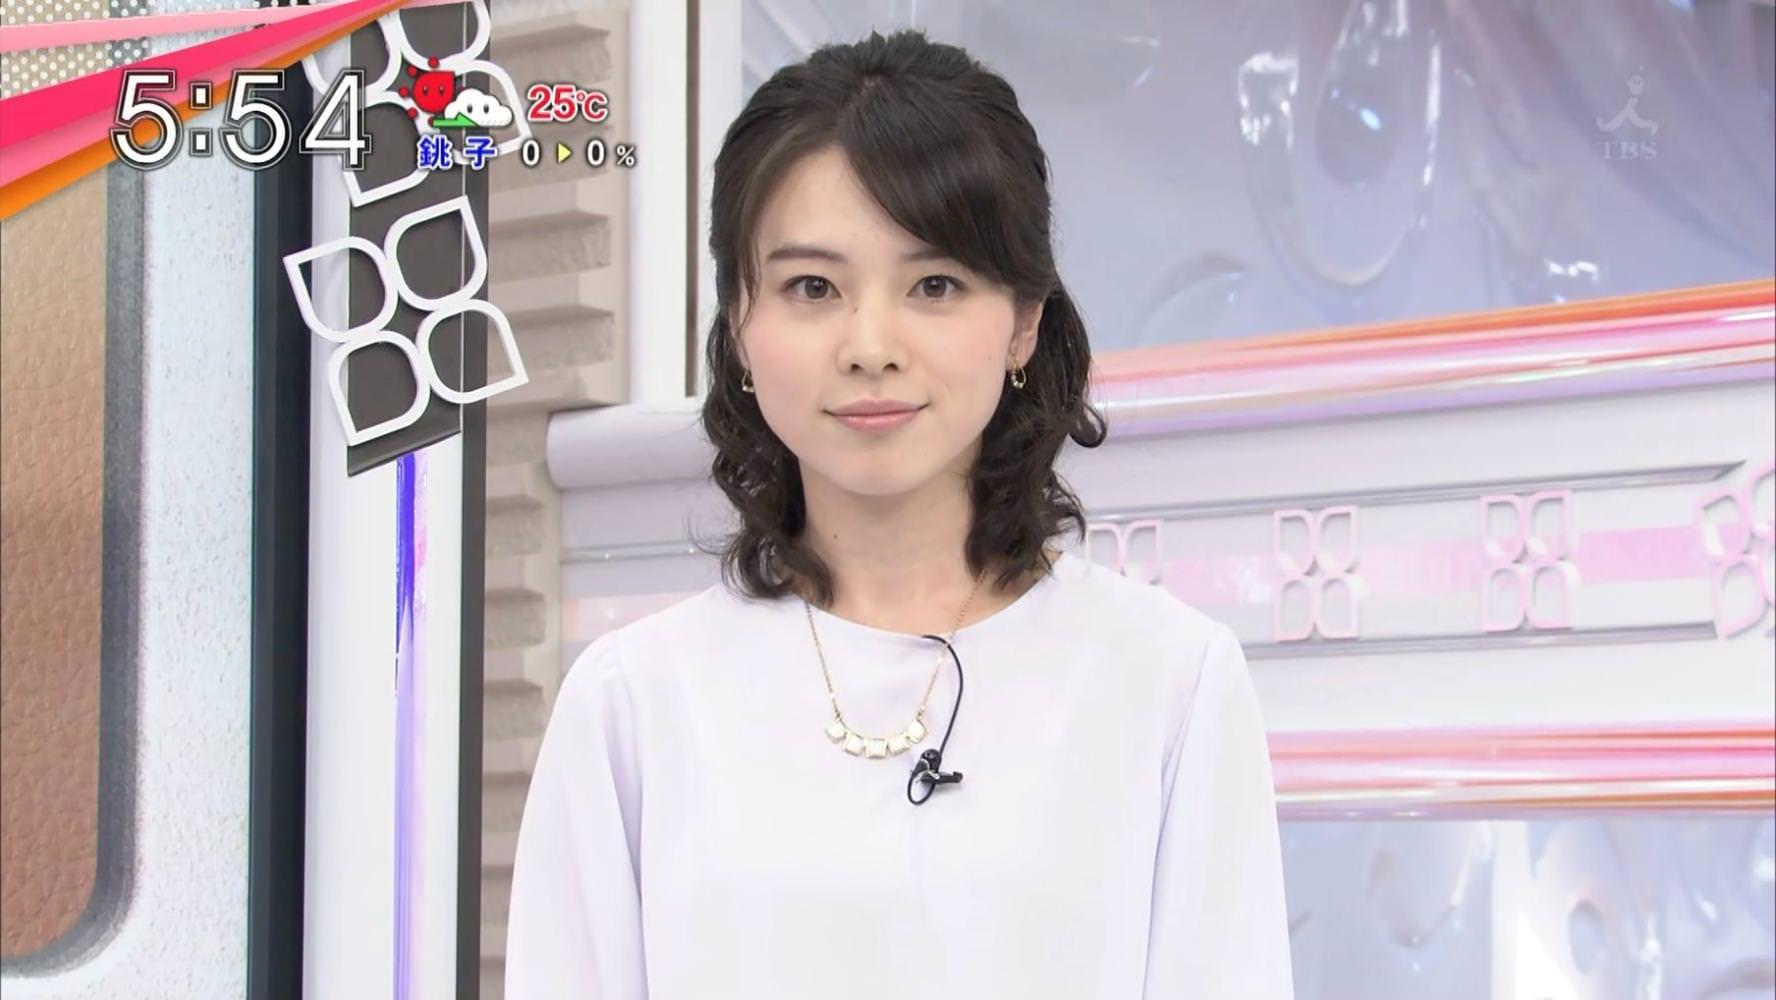 TBSの新人・皆川玲奈アナ 下着も露わな大胆濡れ場の過去が発掘される!